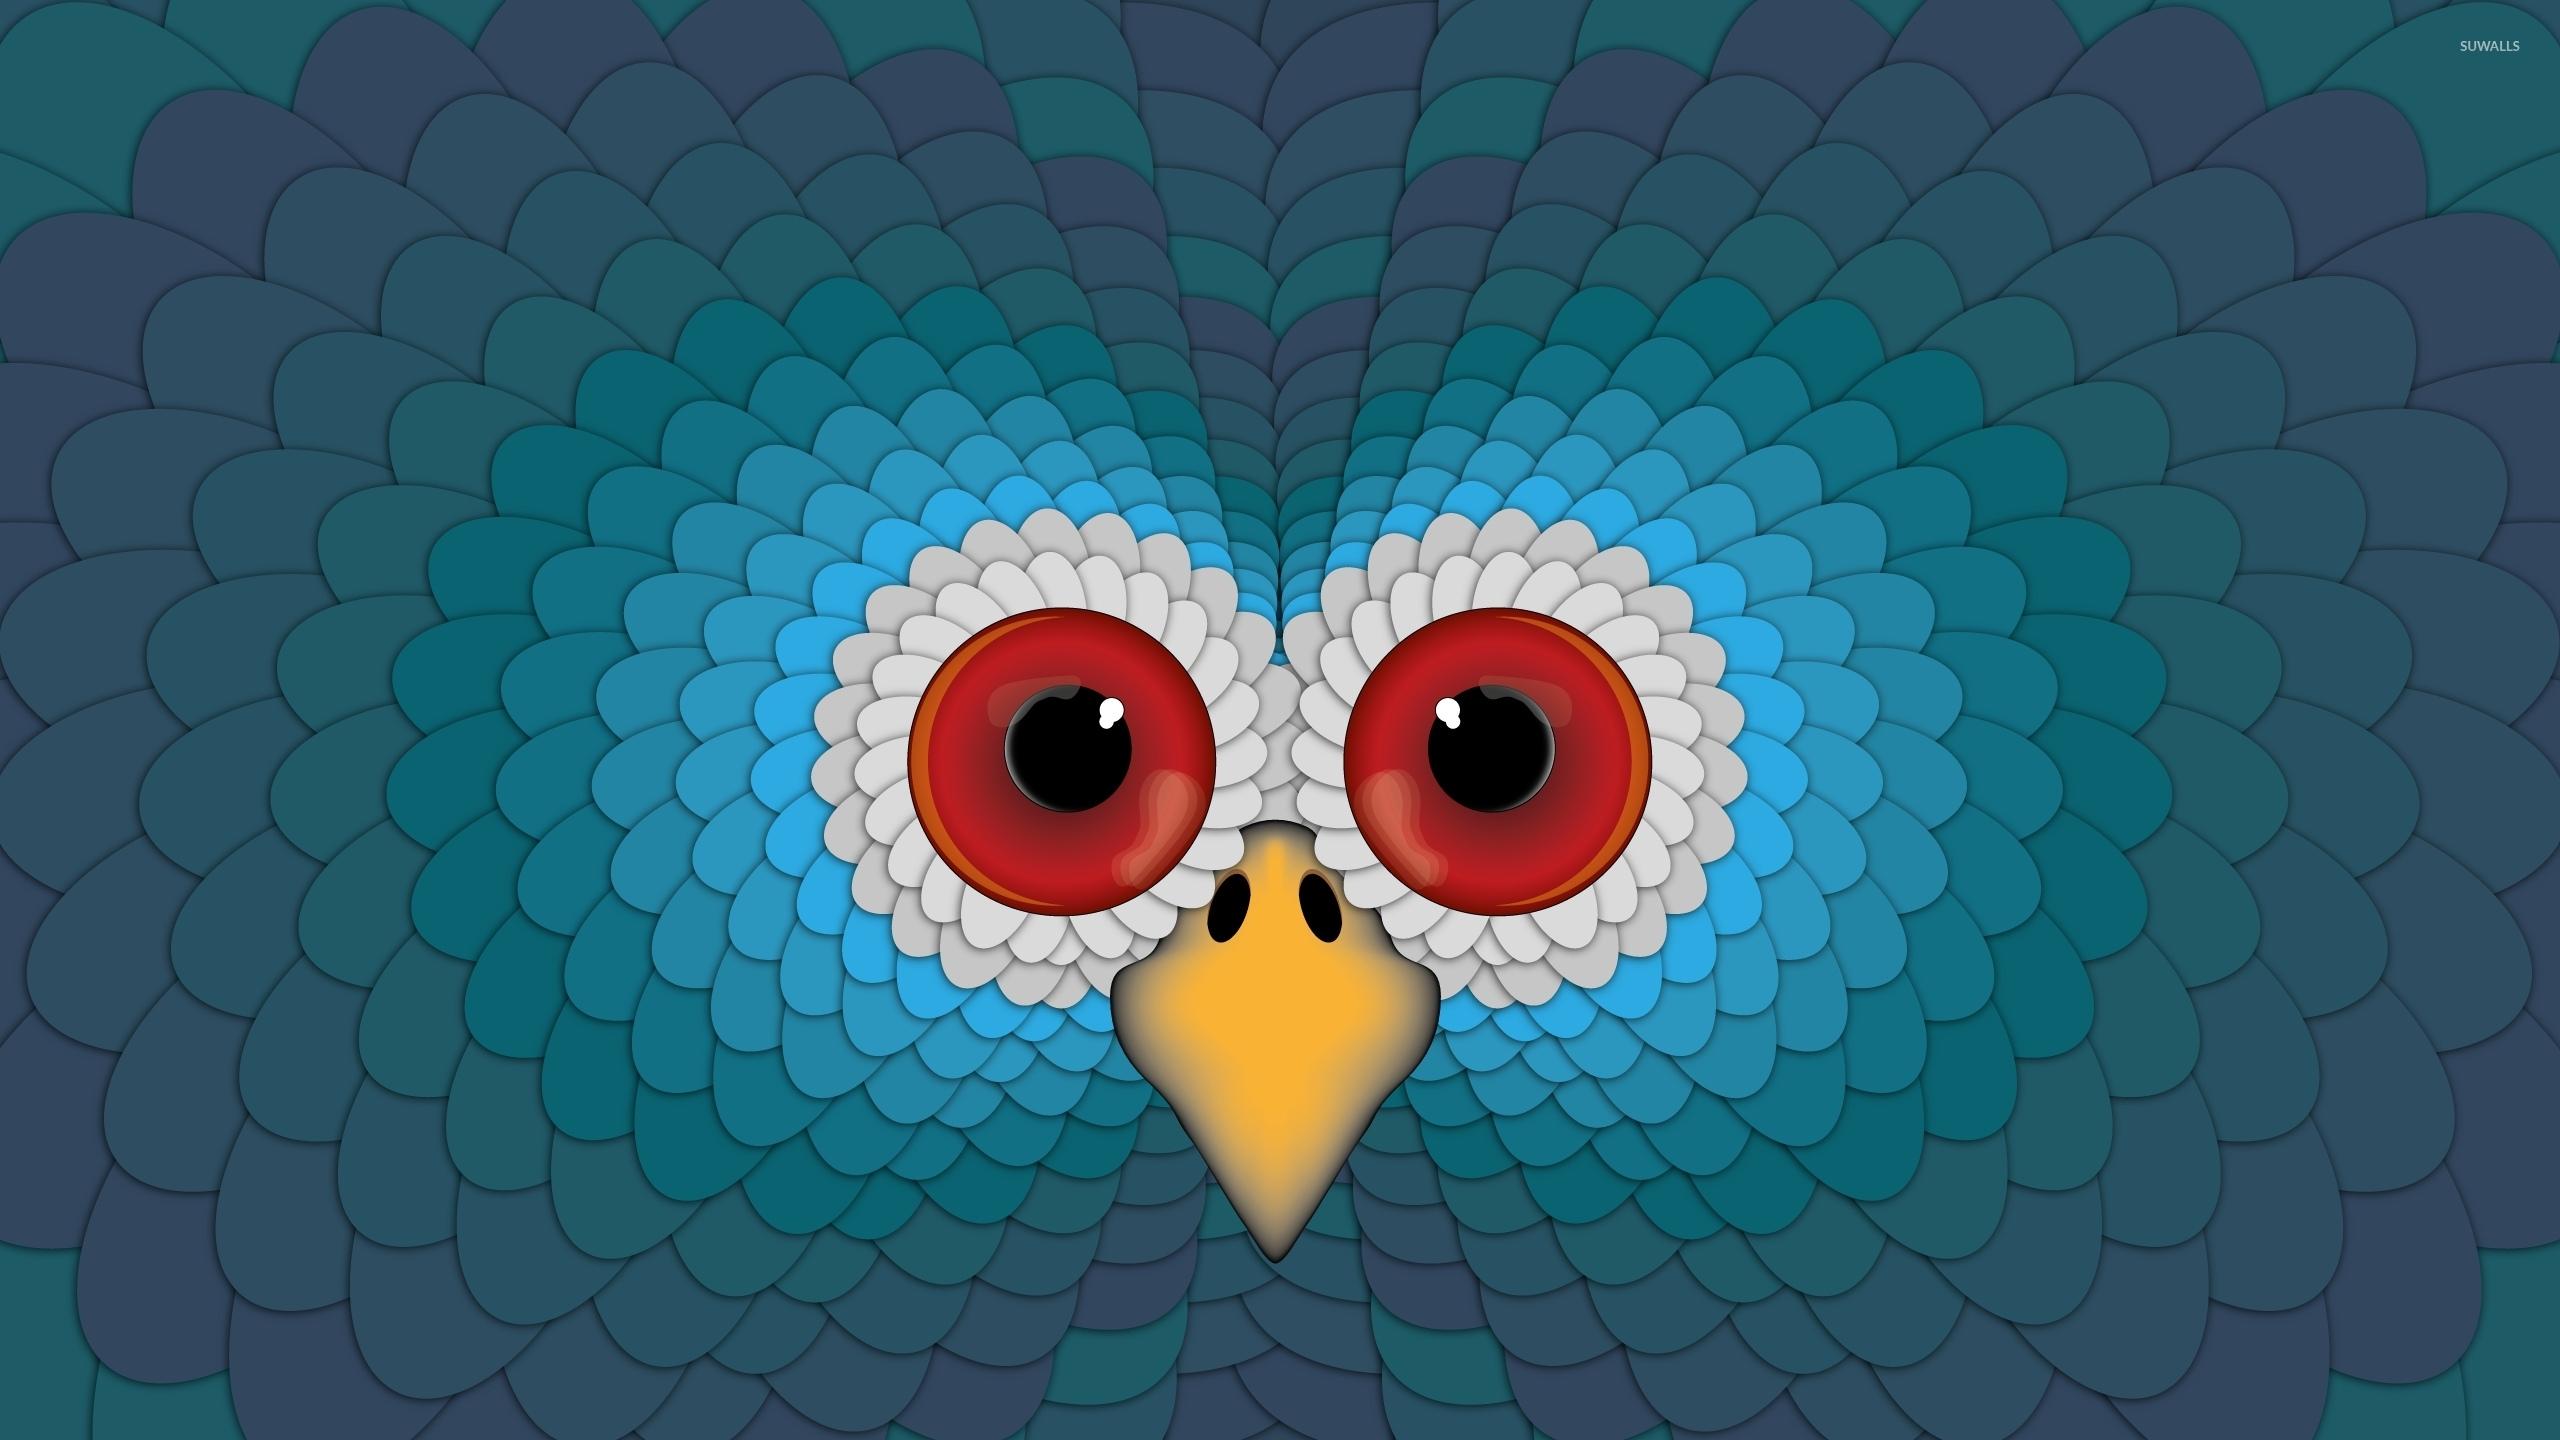 Hypnotic Eyes Of A Turkey Wallpaper